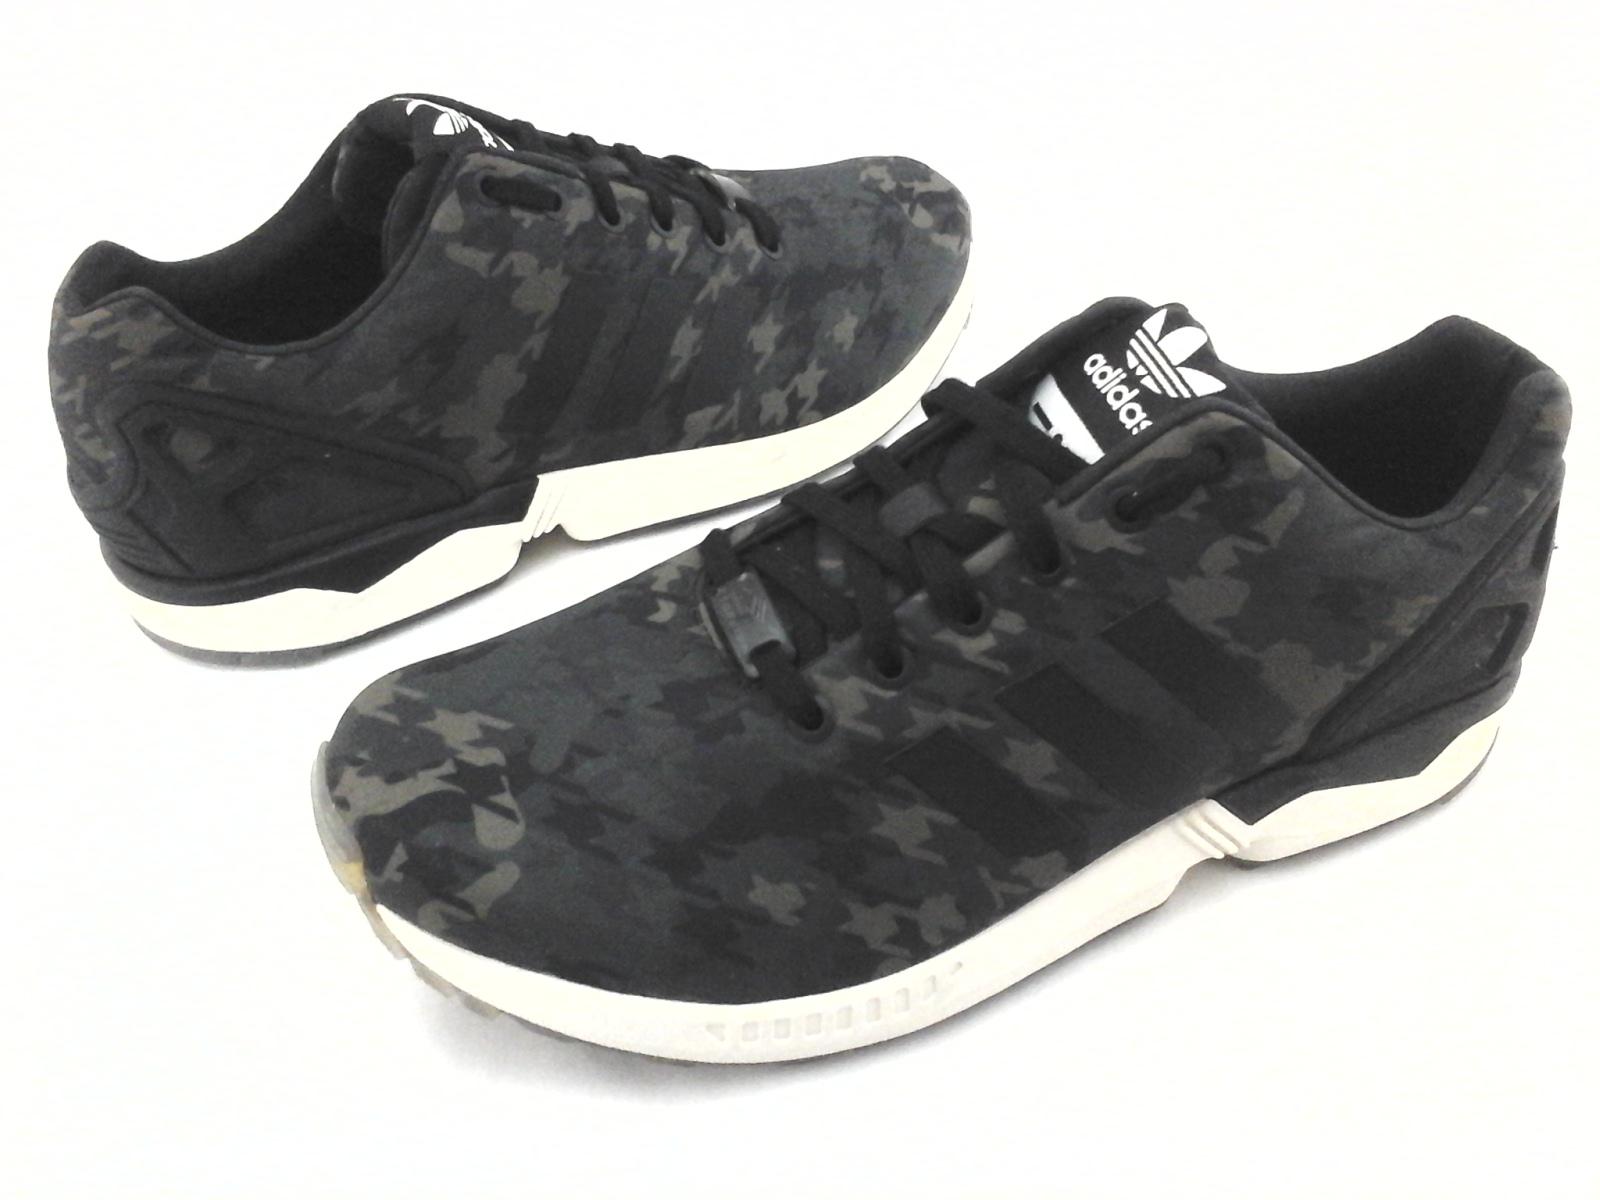 big sale e056e c6e0e ADIDAS Sneakers Torsion Green Camo ZX Flux B32742 Mens US 10.5 EU 44 23  RARE